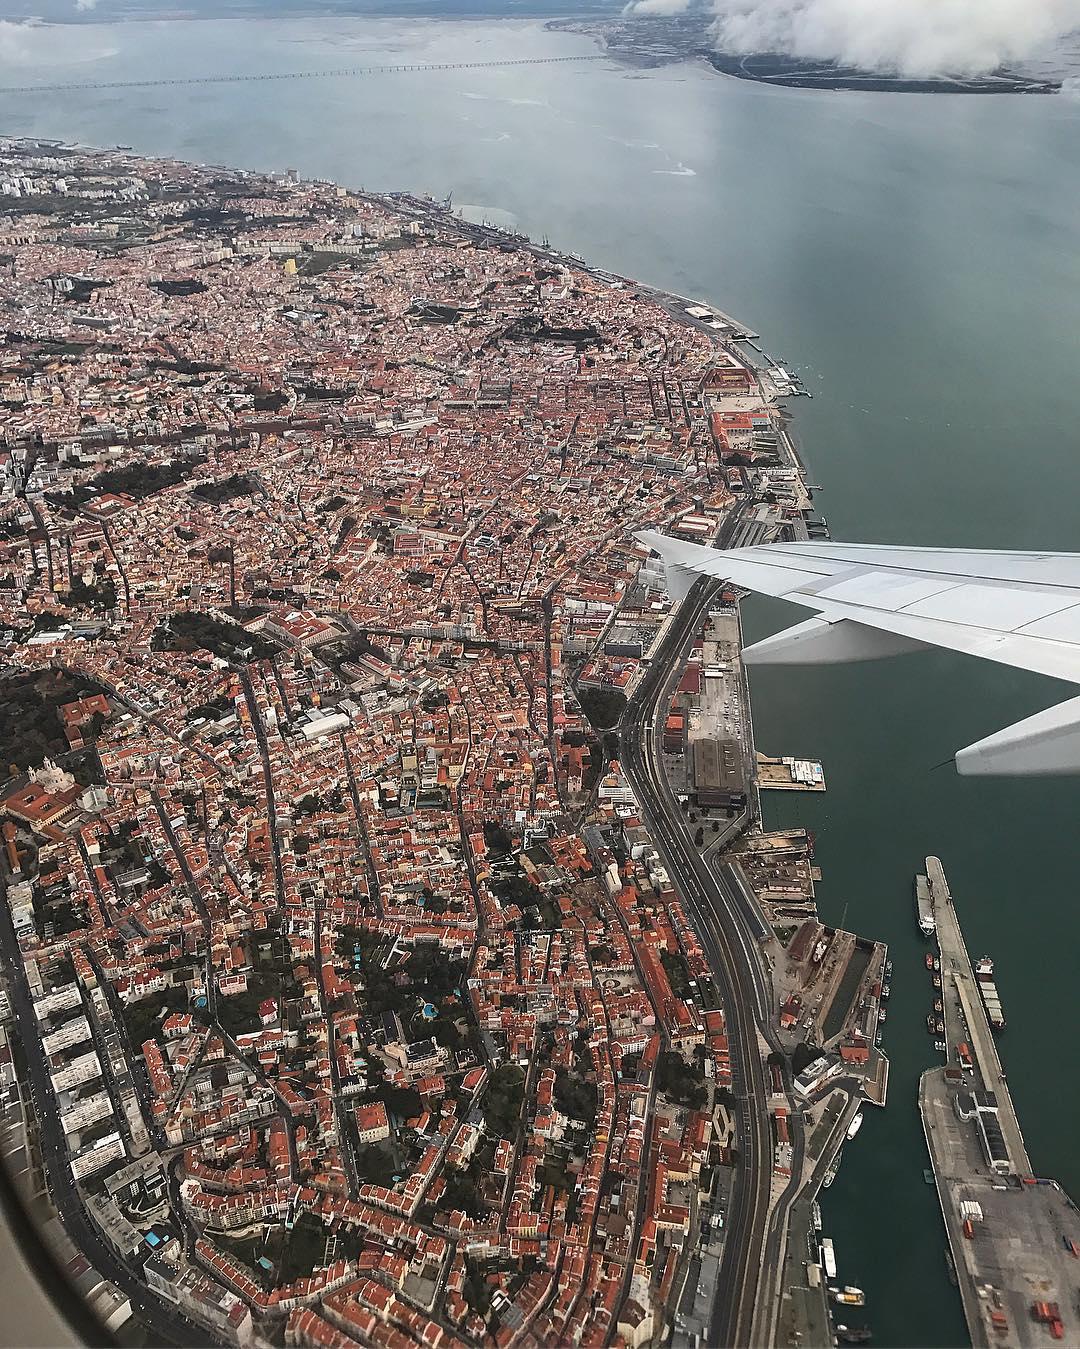 Cidade de Lisboa vista de cima